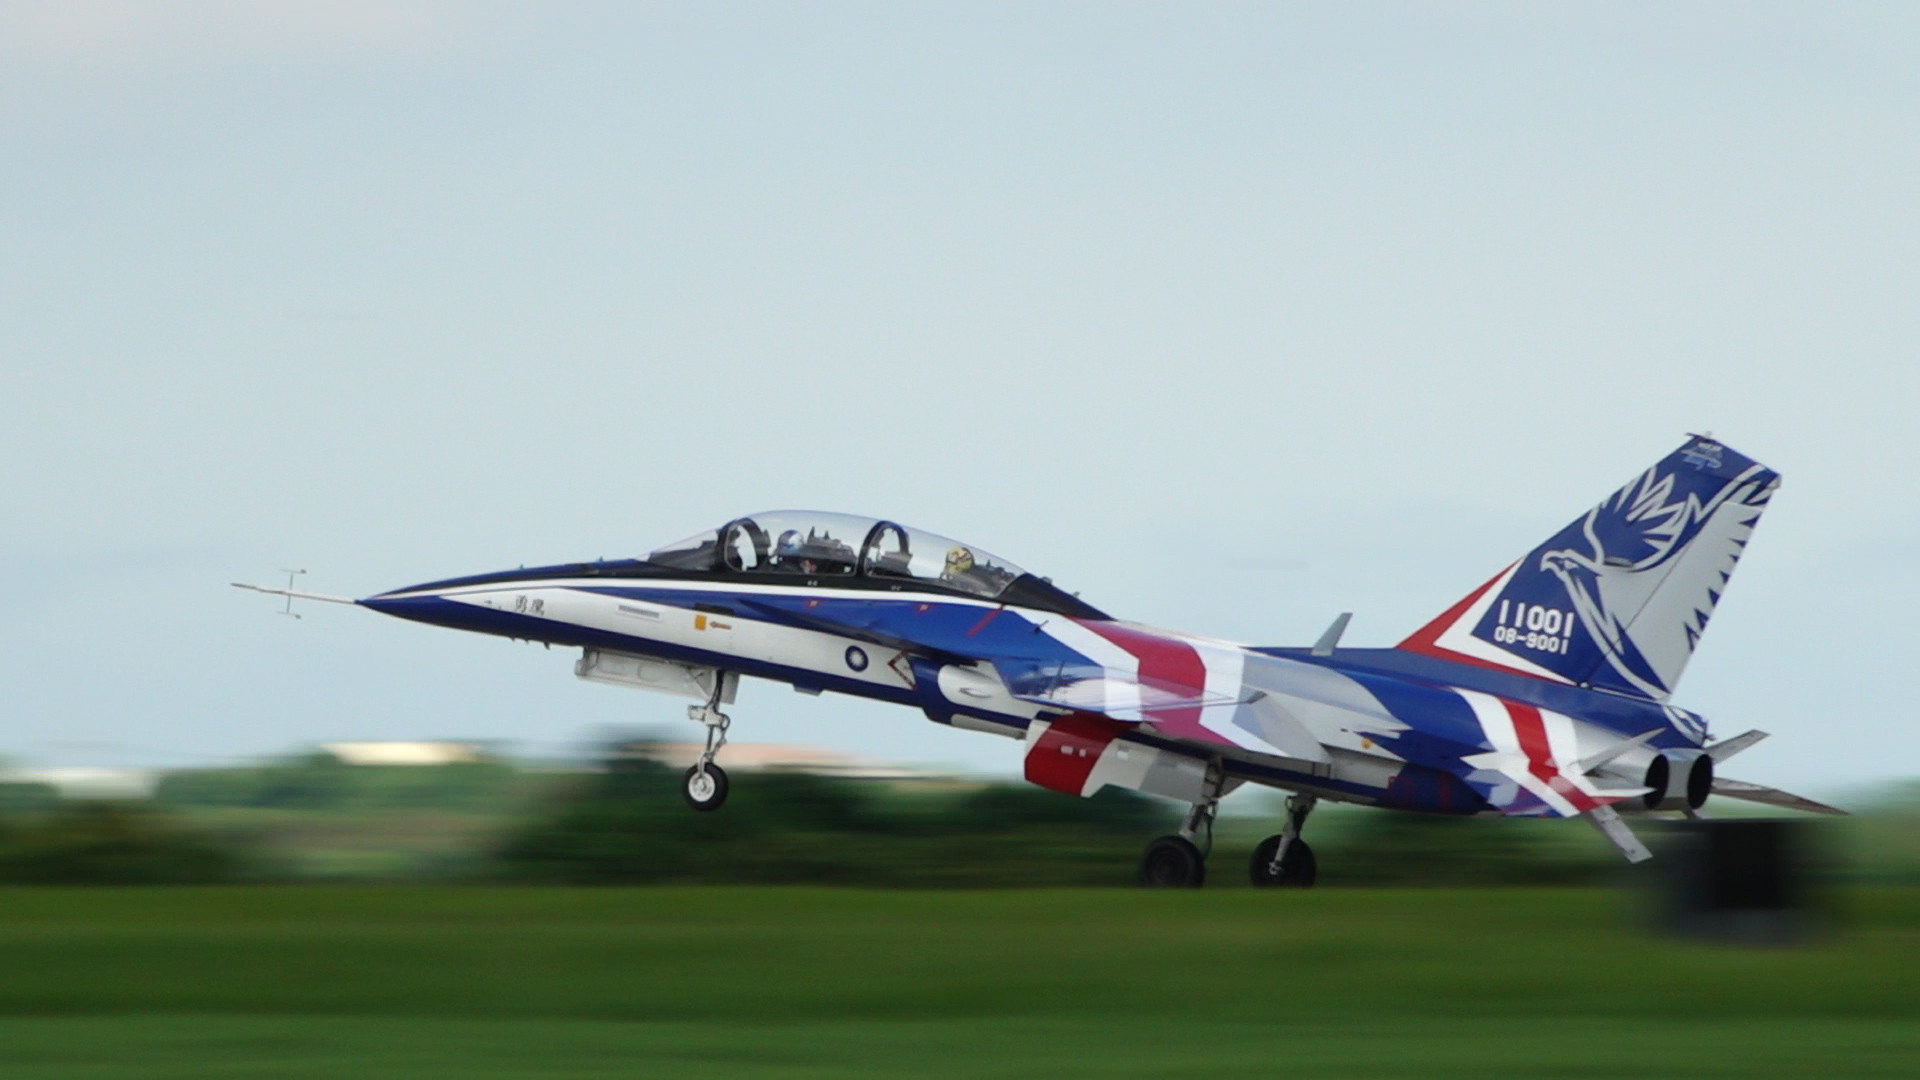 F-5E,國防部,空軍司令部,勇鷹高教機,美國空軍